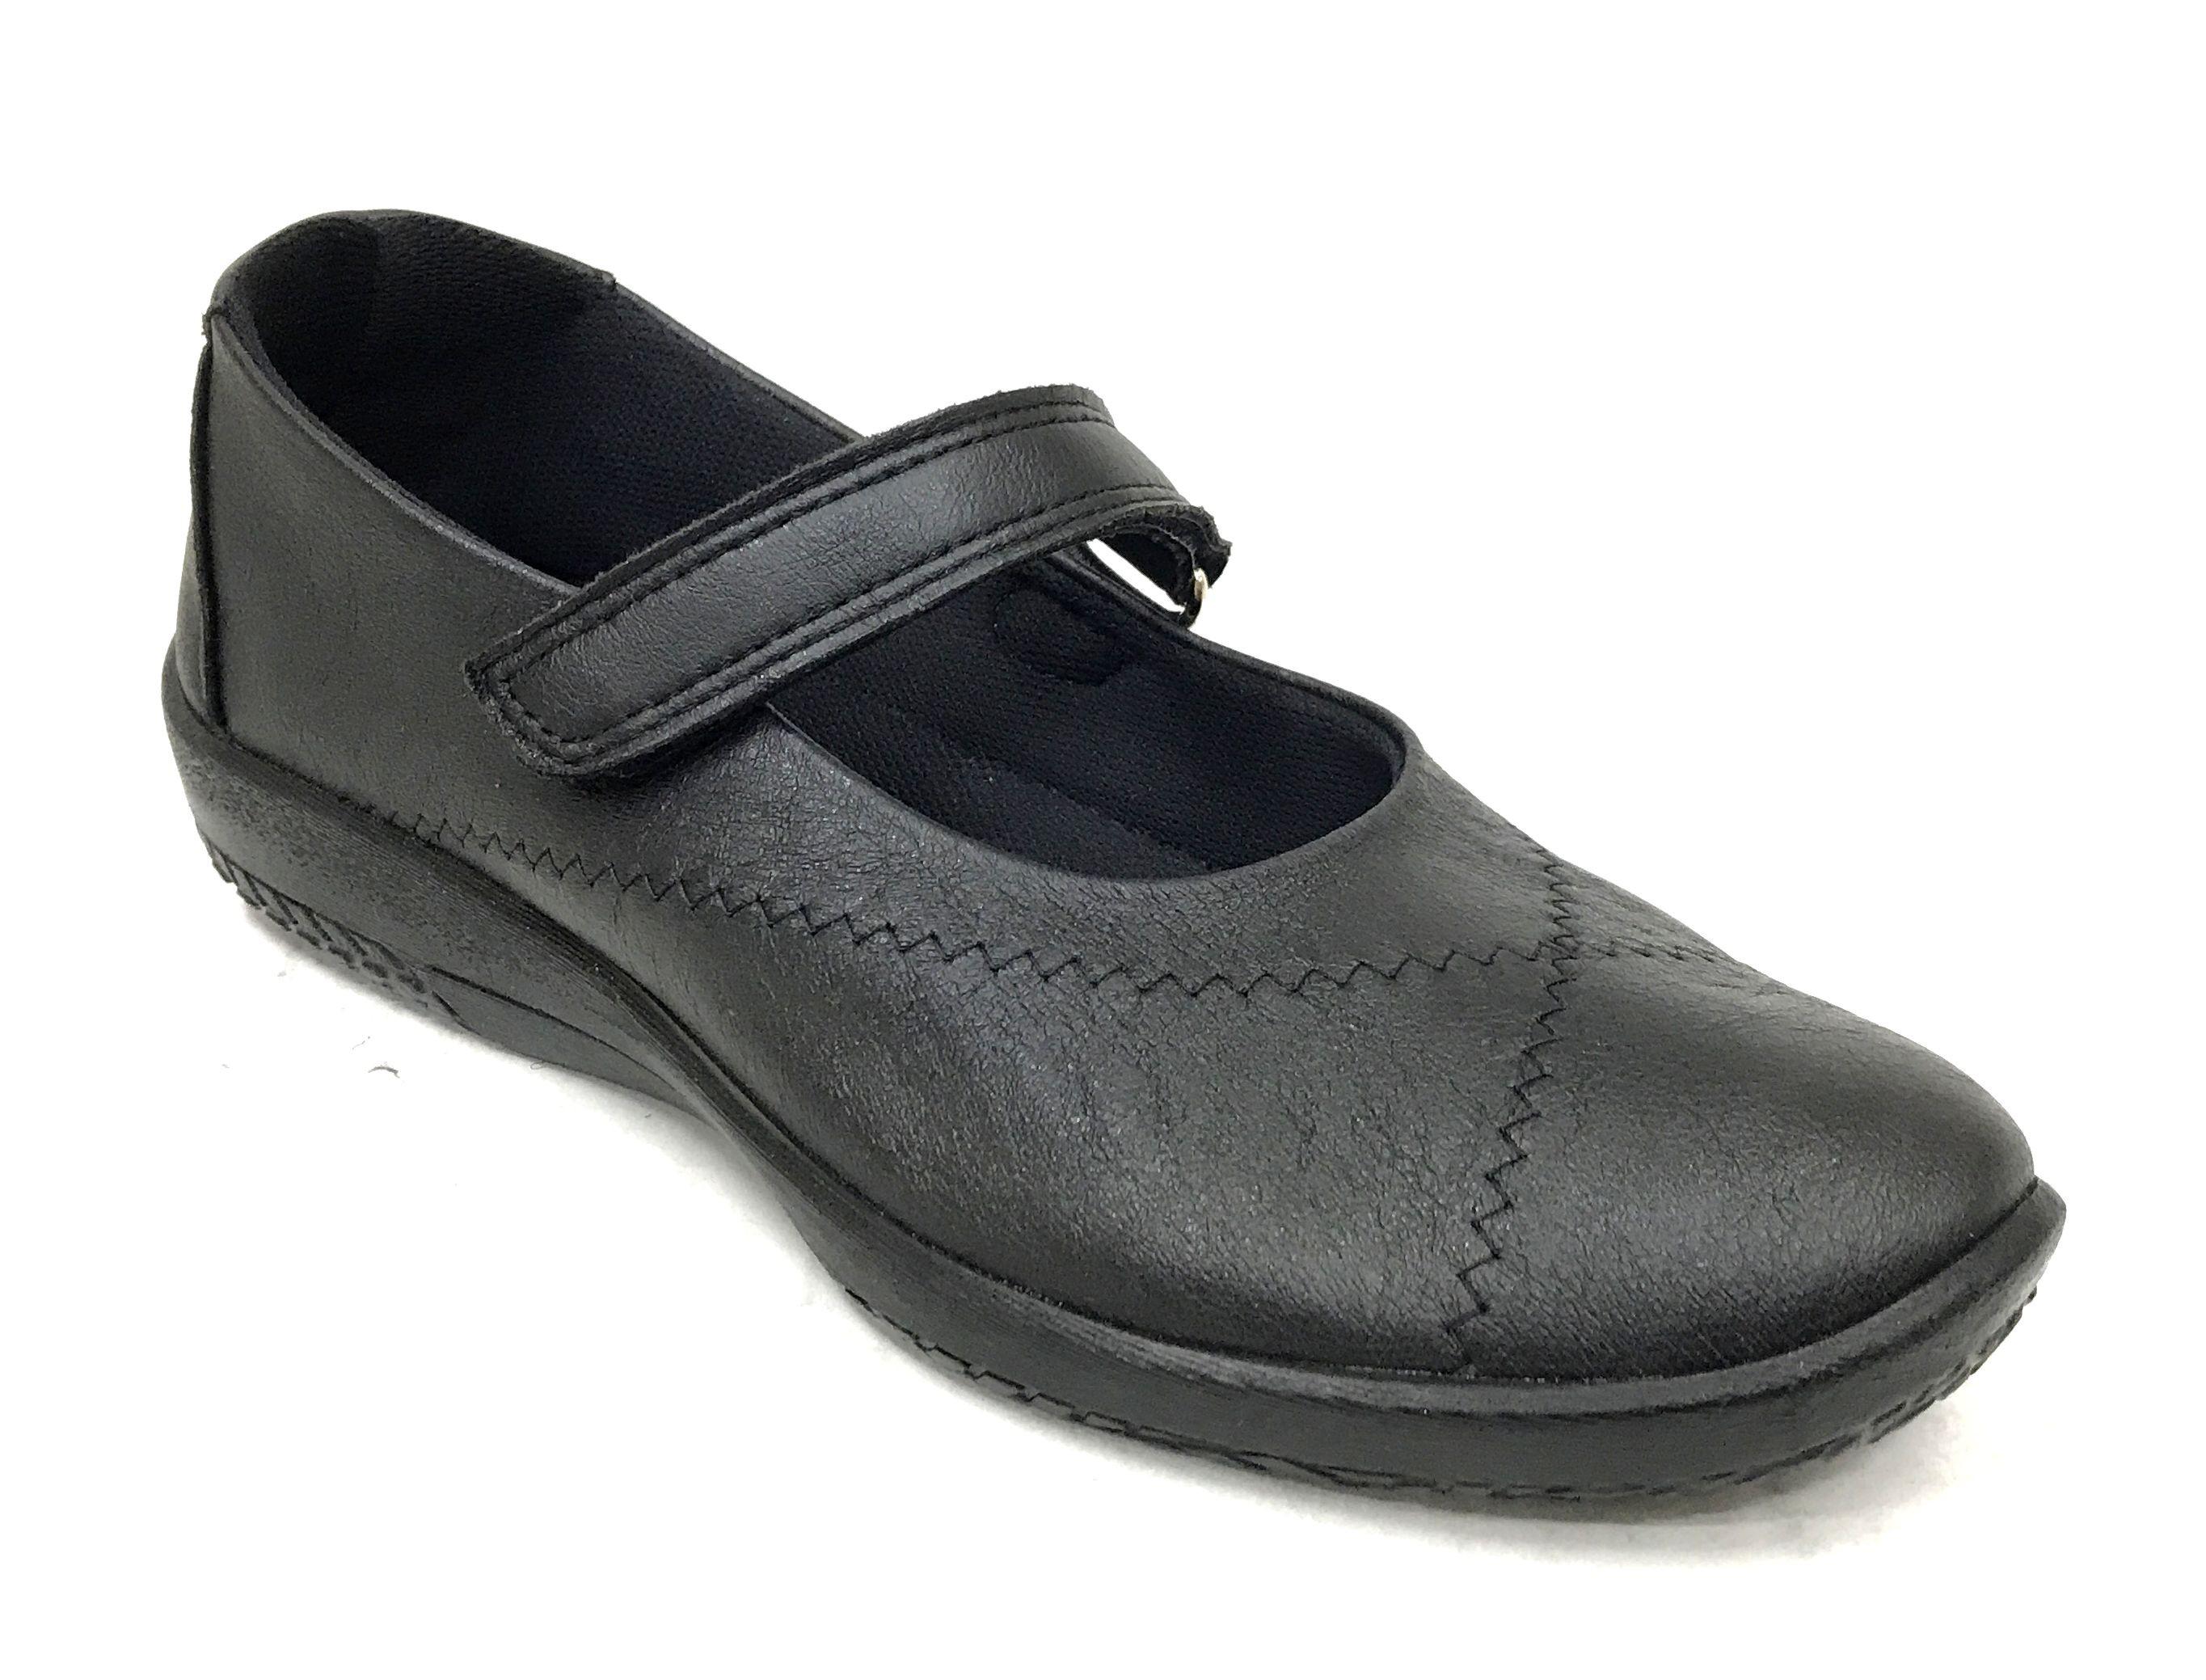 Zapatos negros Arcopedico para mujer cnDPa7tY7